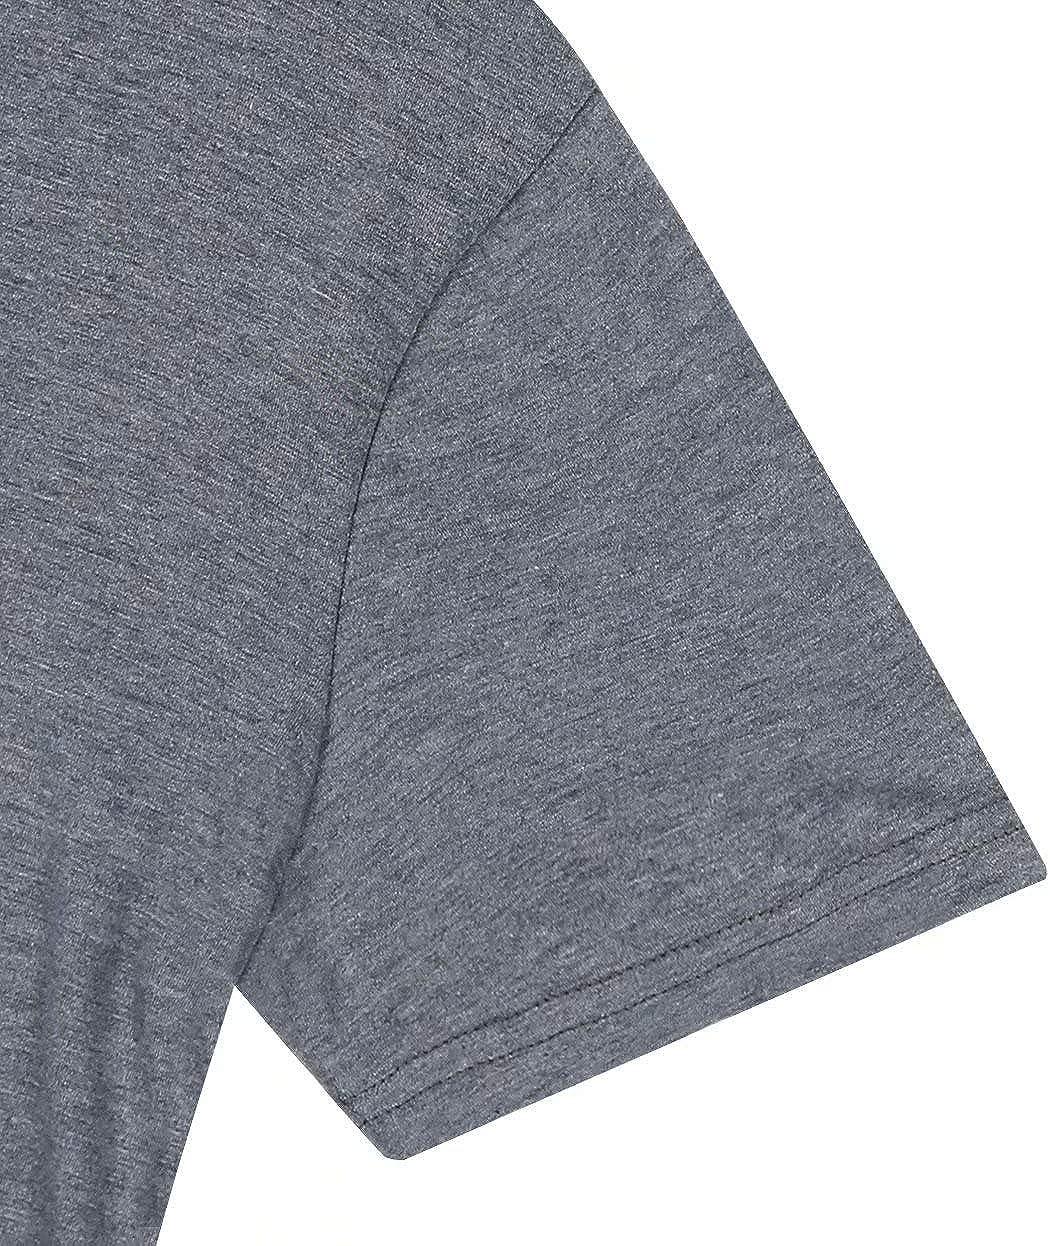 Women Merry Christmas Leopard Plaid Tree Shirt Top Short Sleeve Casual Graphic Print T Shirt